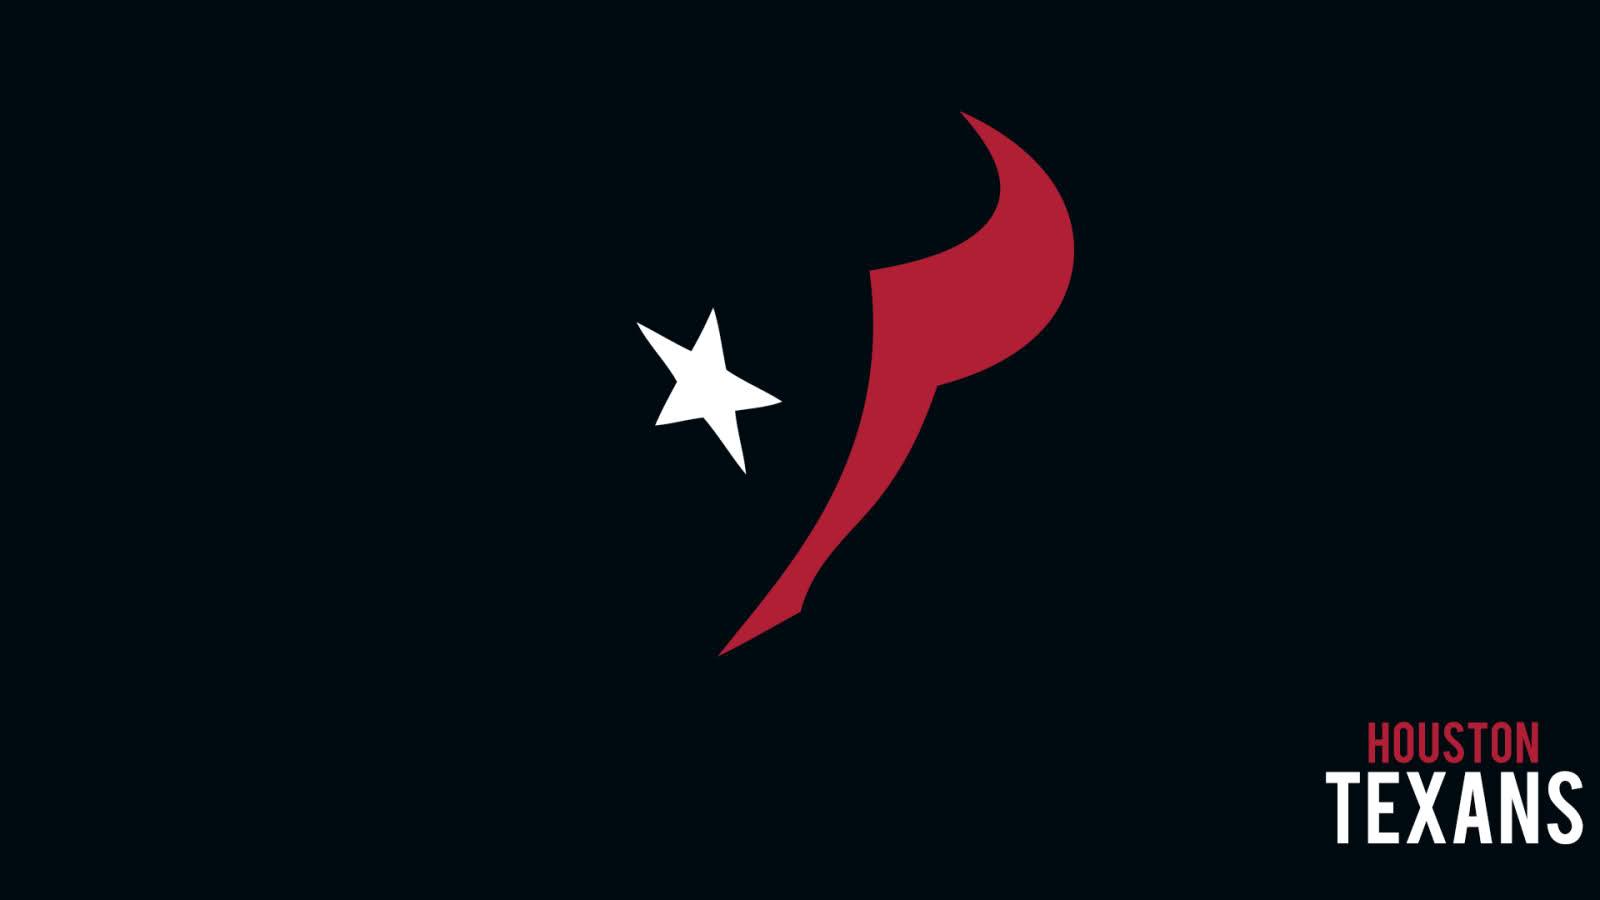 Houston Texans Wallpaper Jj Watt Houston texans hunting buffalo 1600x900